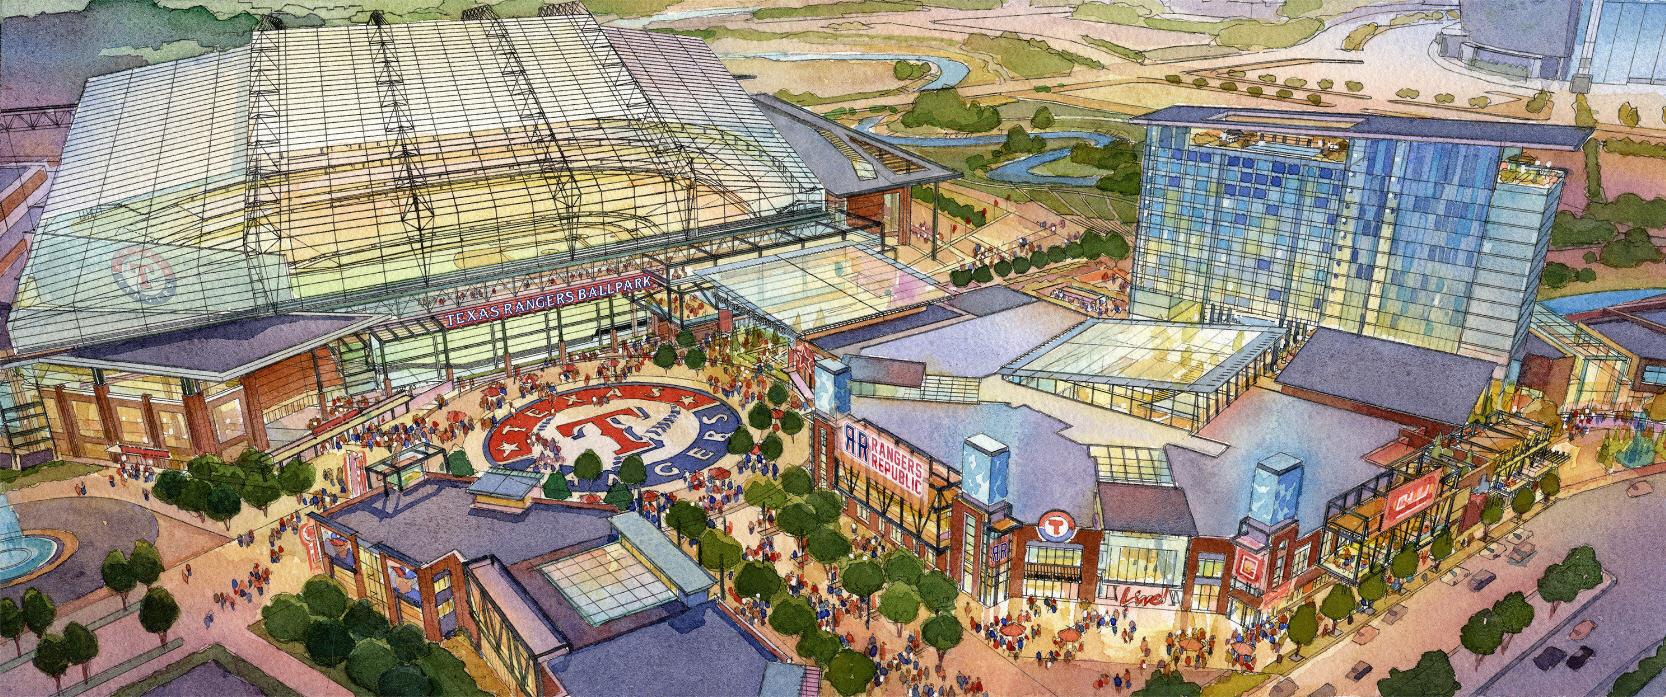 Texas Rangers Arlington Announce Plans For New 1 Billion